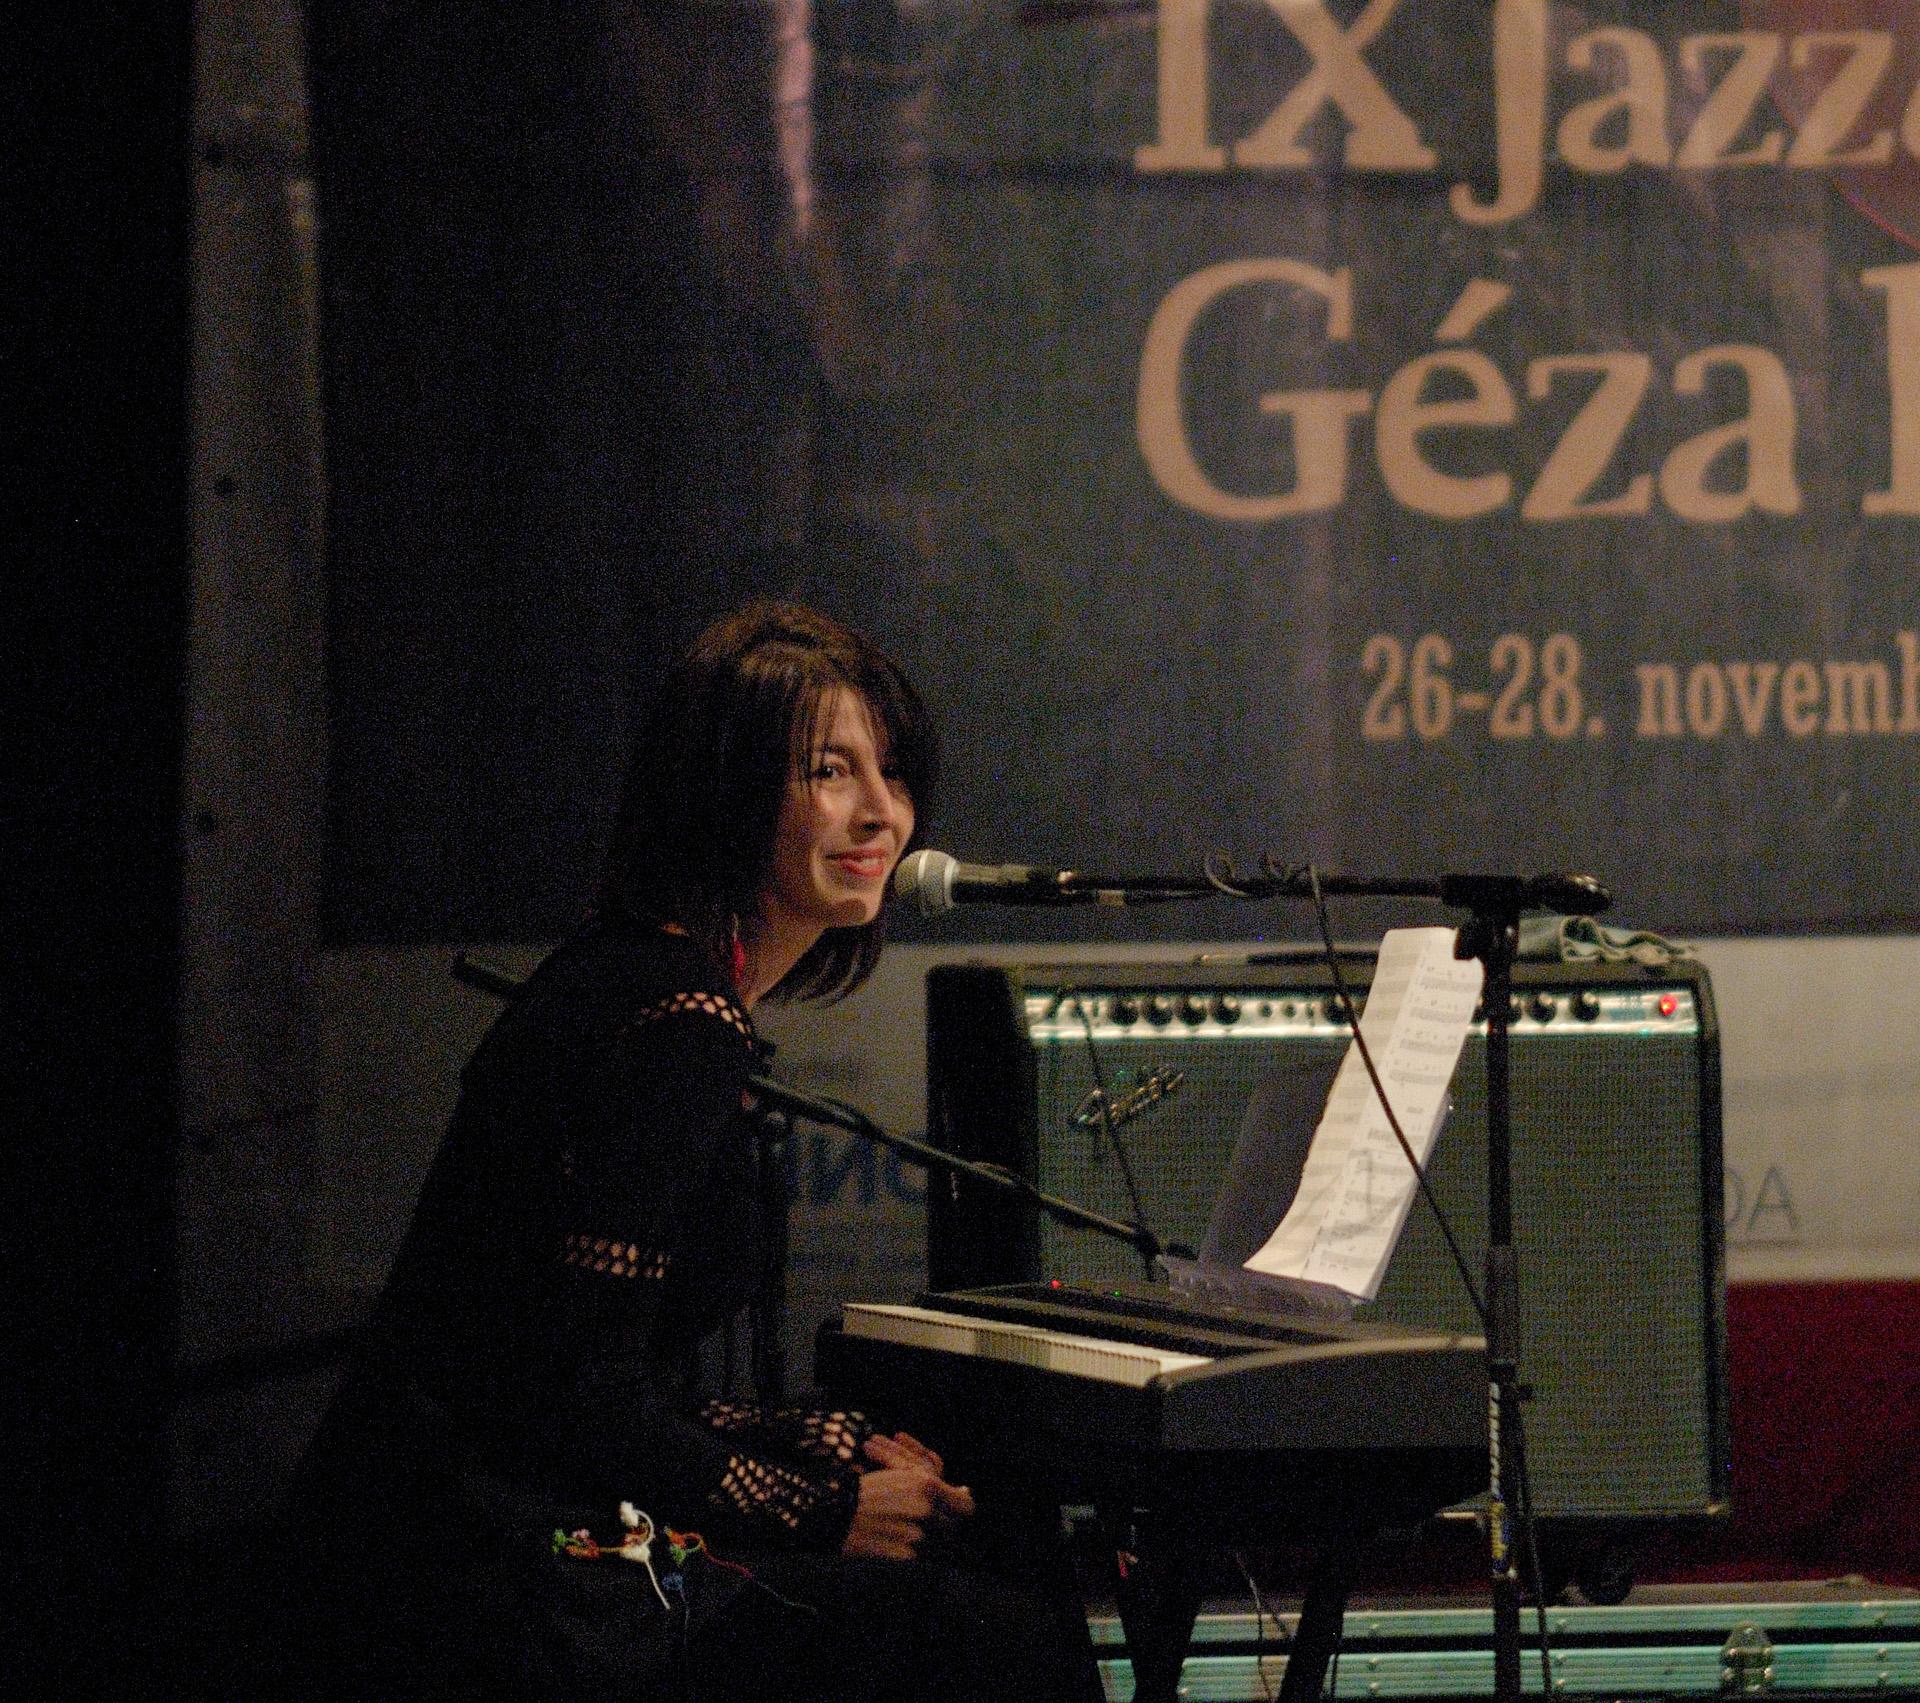 Blues and jazz festival Geza Balasz - Gari, Kikinda 2010.